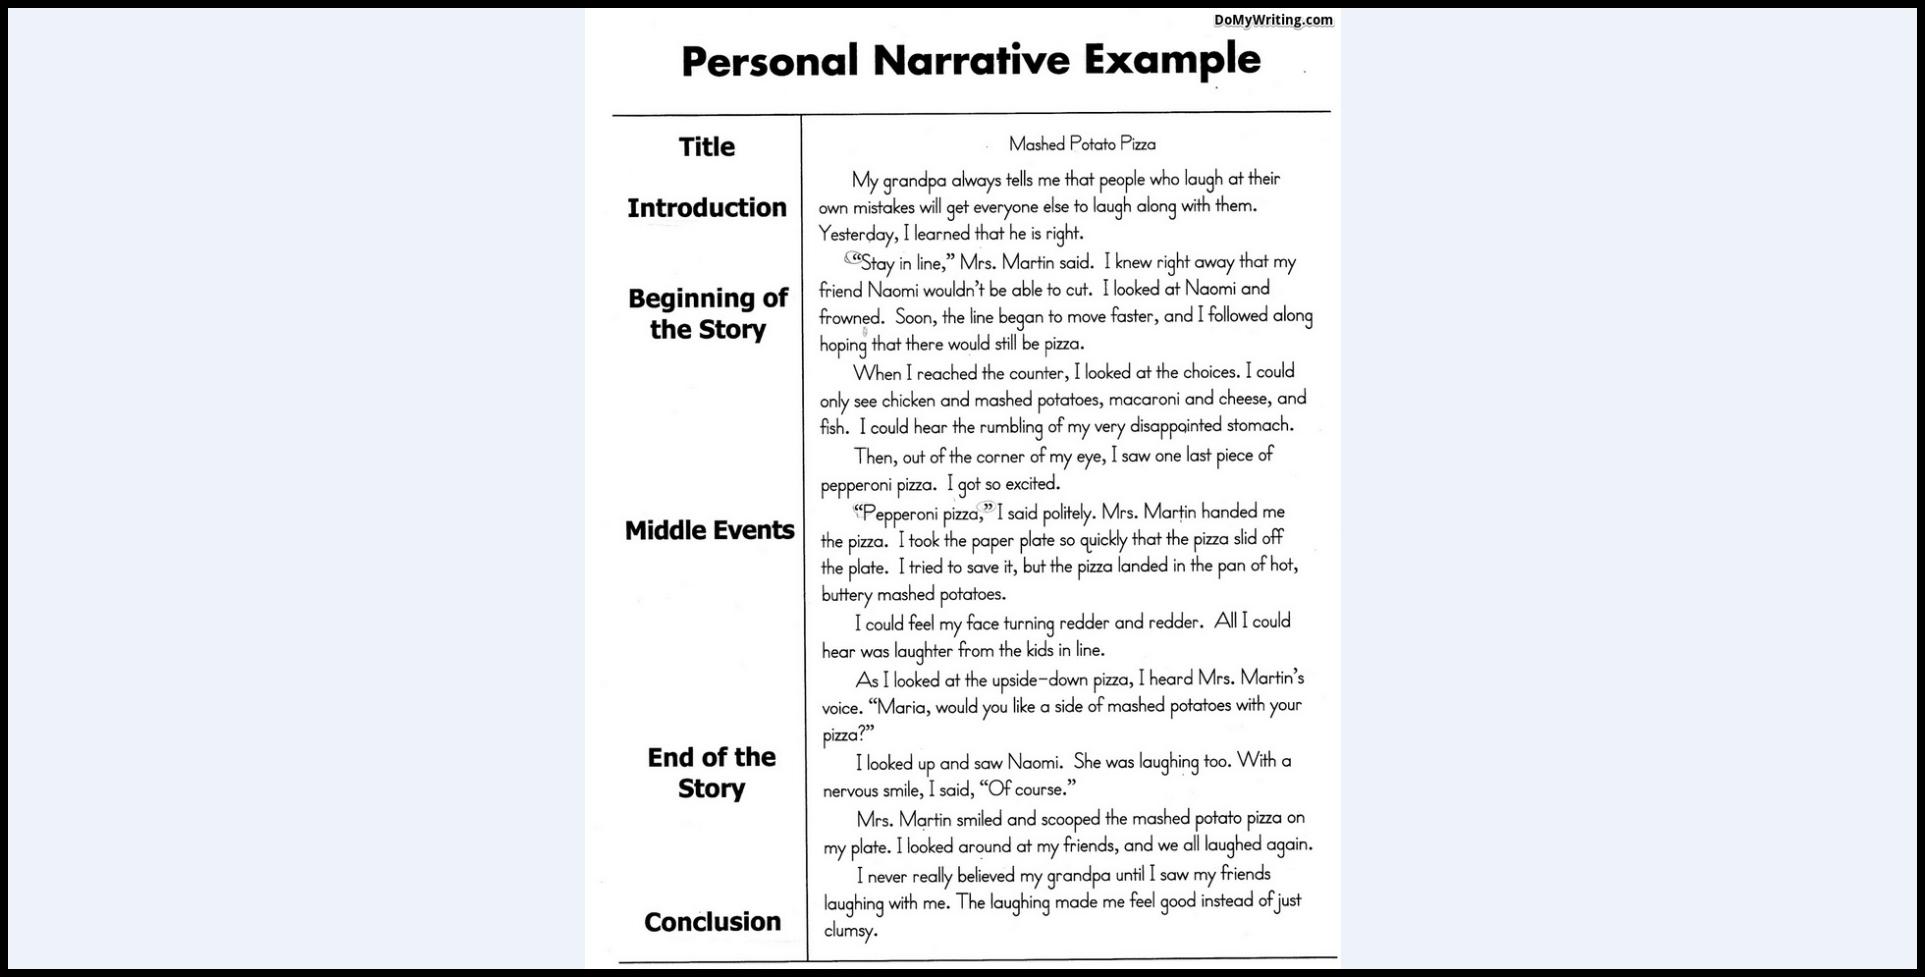 002 Narration Essay Narrative Unbelievable Format College Outline Pdf Full